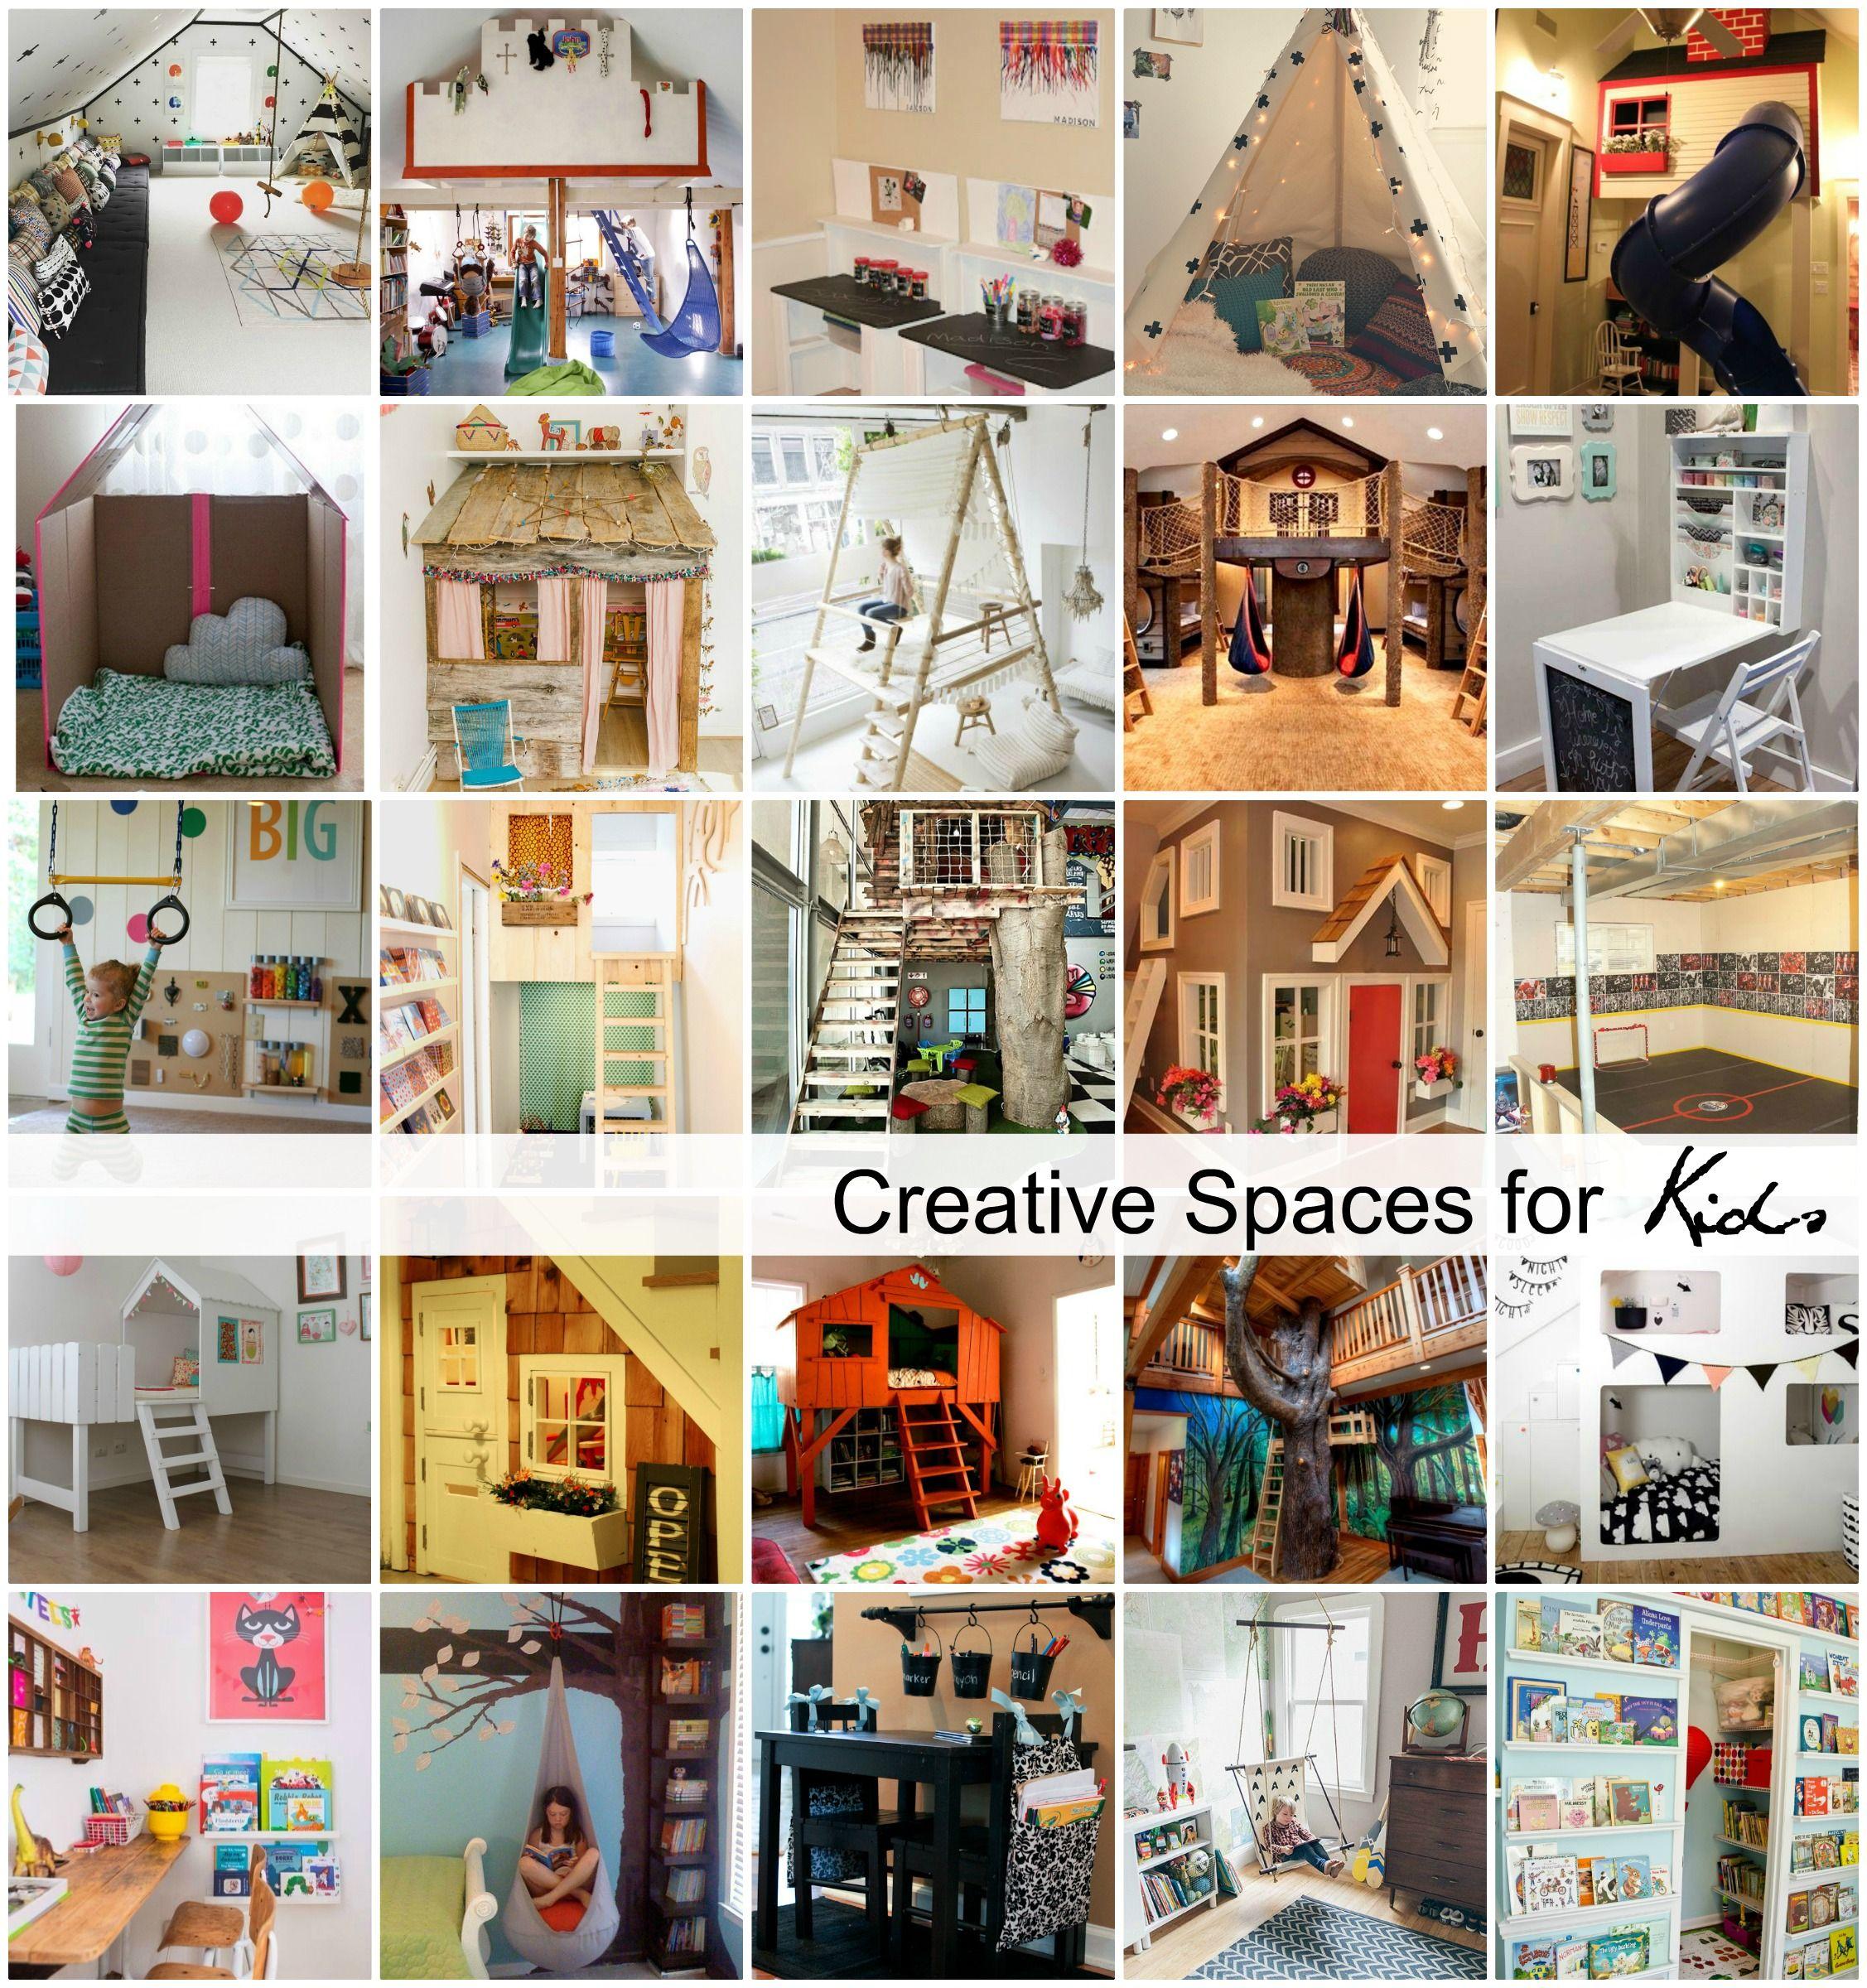 Creative-Spaces-Kids-Room-Ideas-1.jpg (2254×2400)